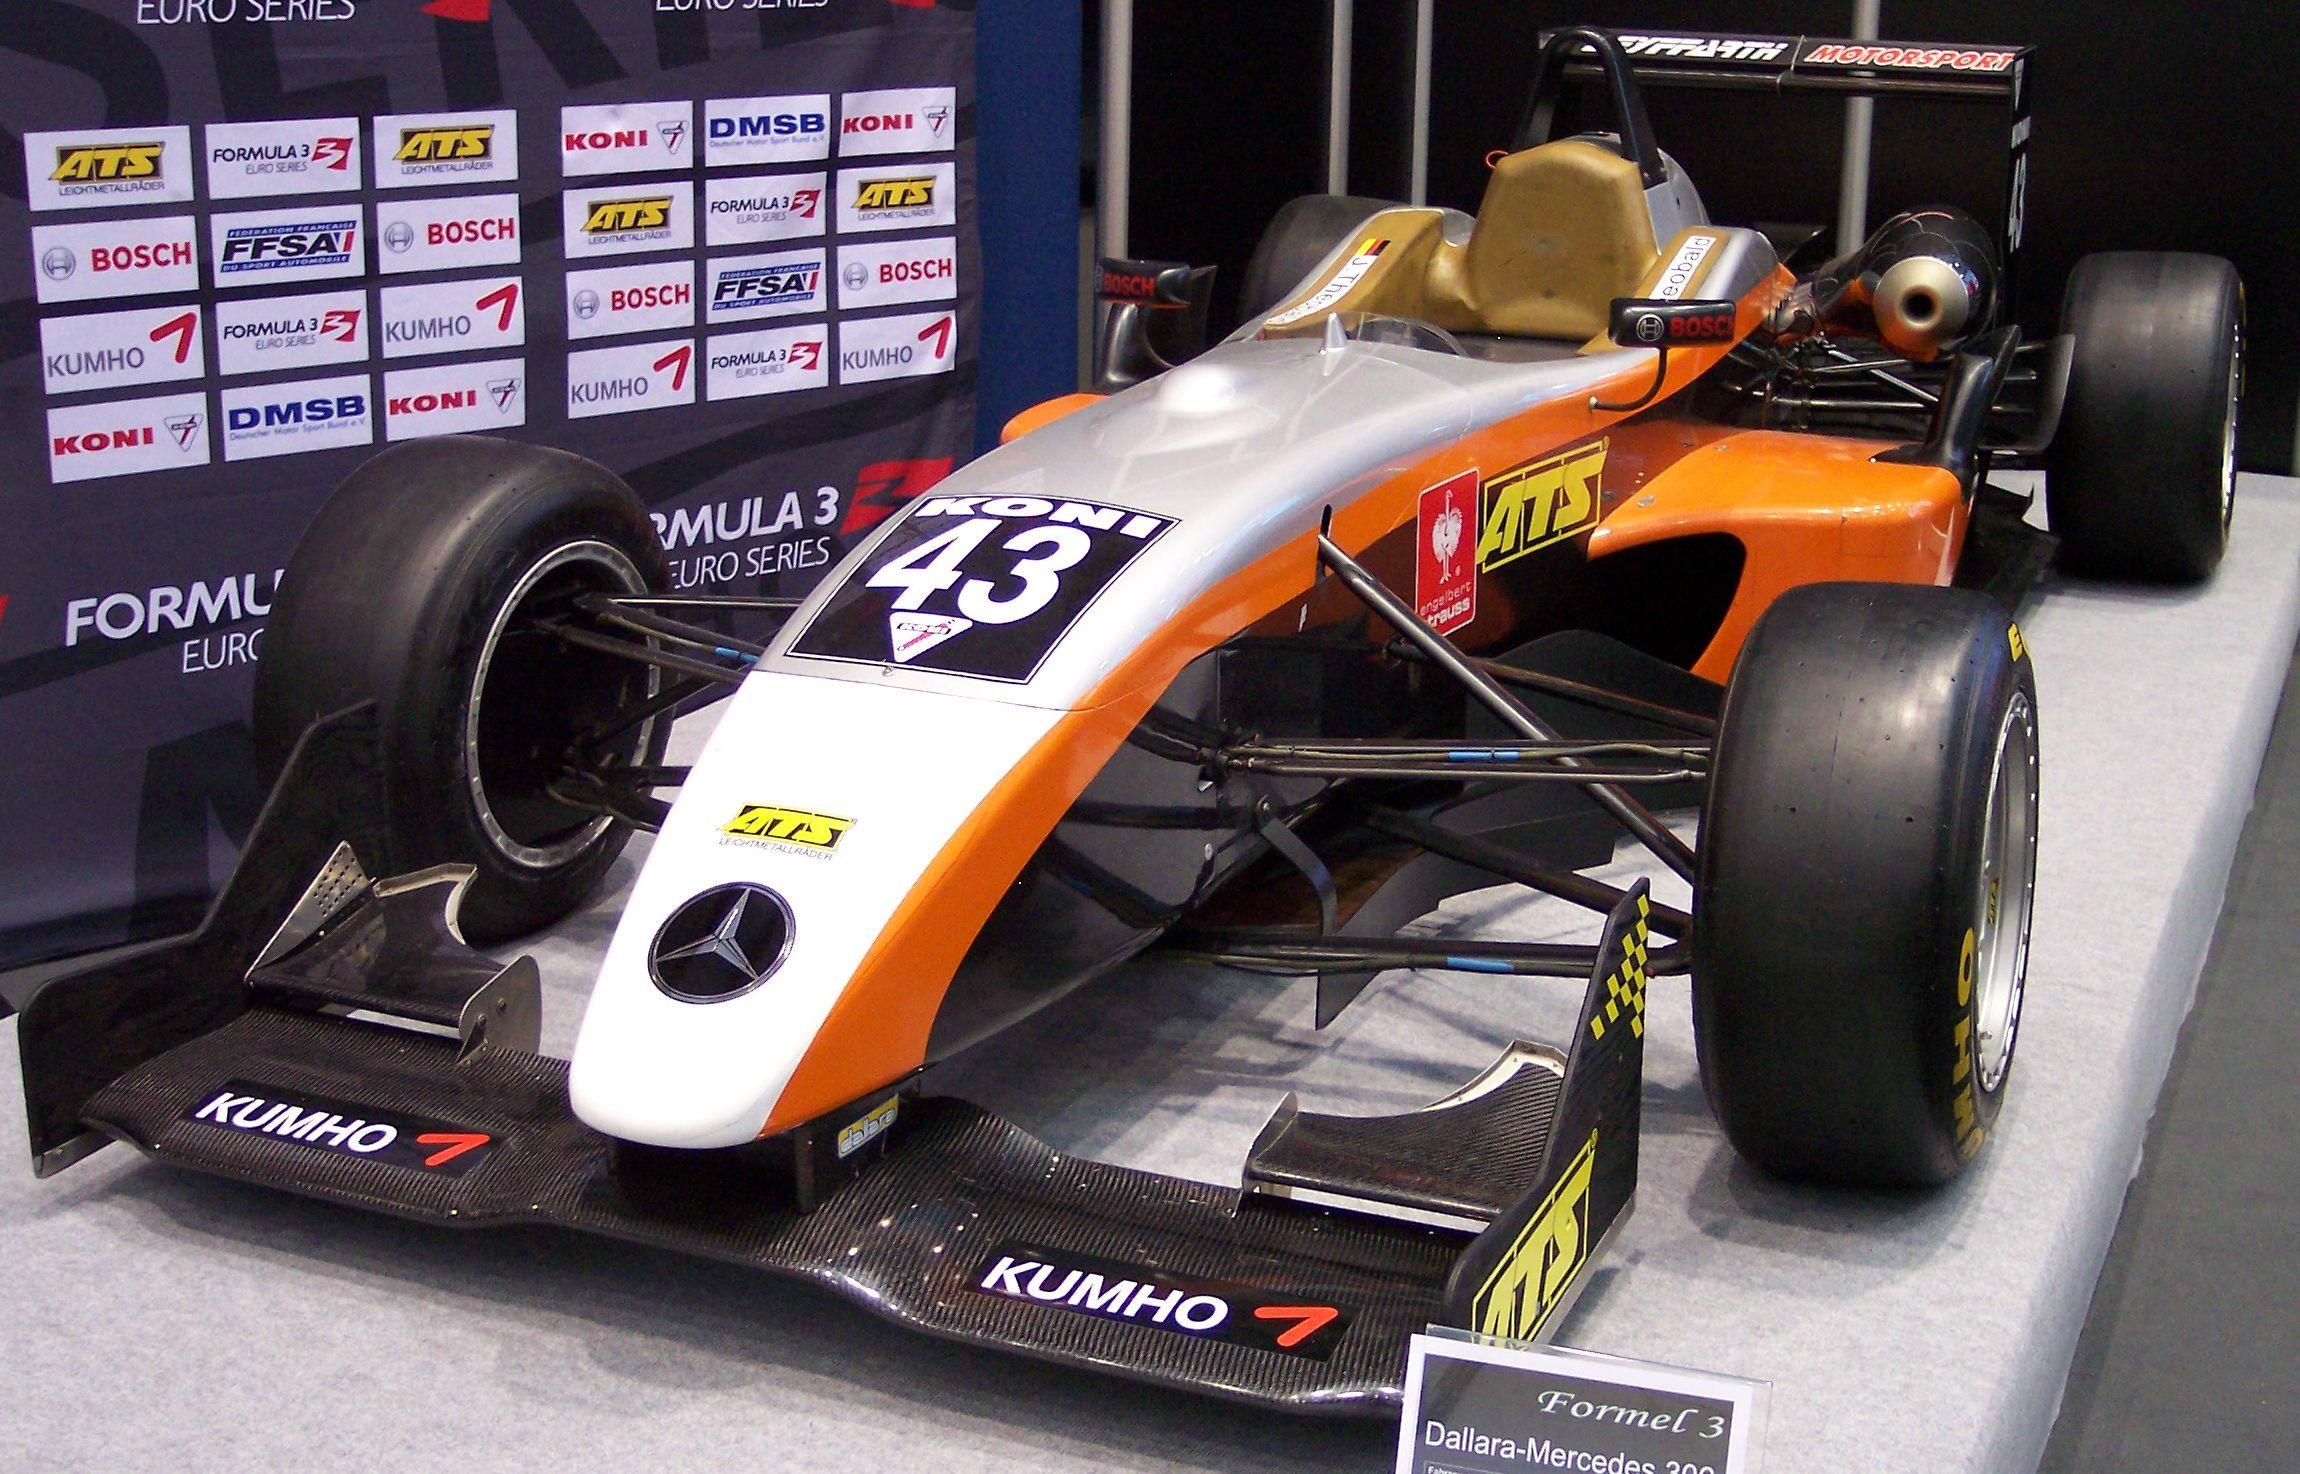 Формула, автогонки